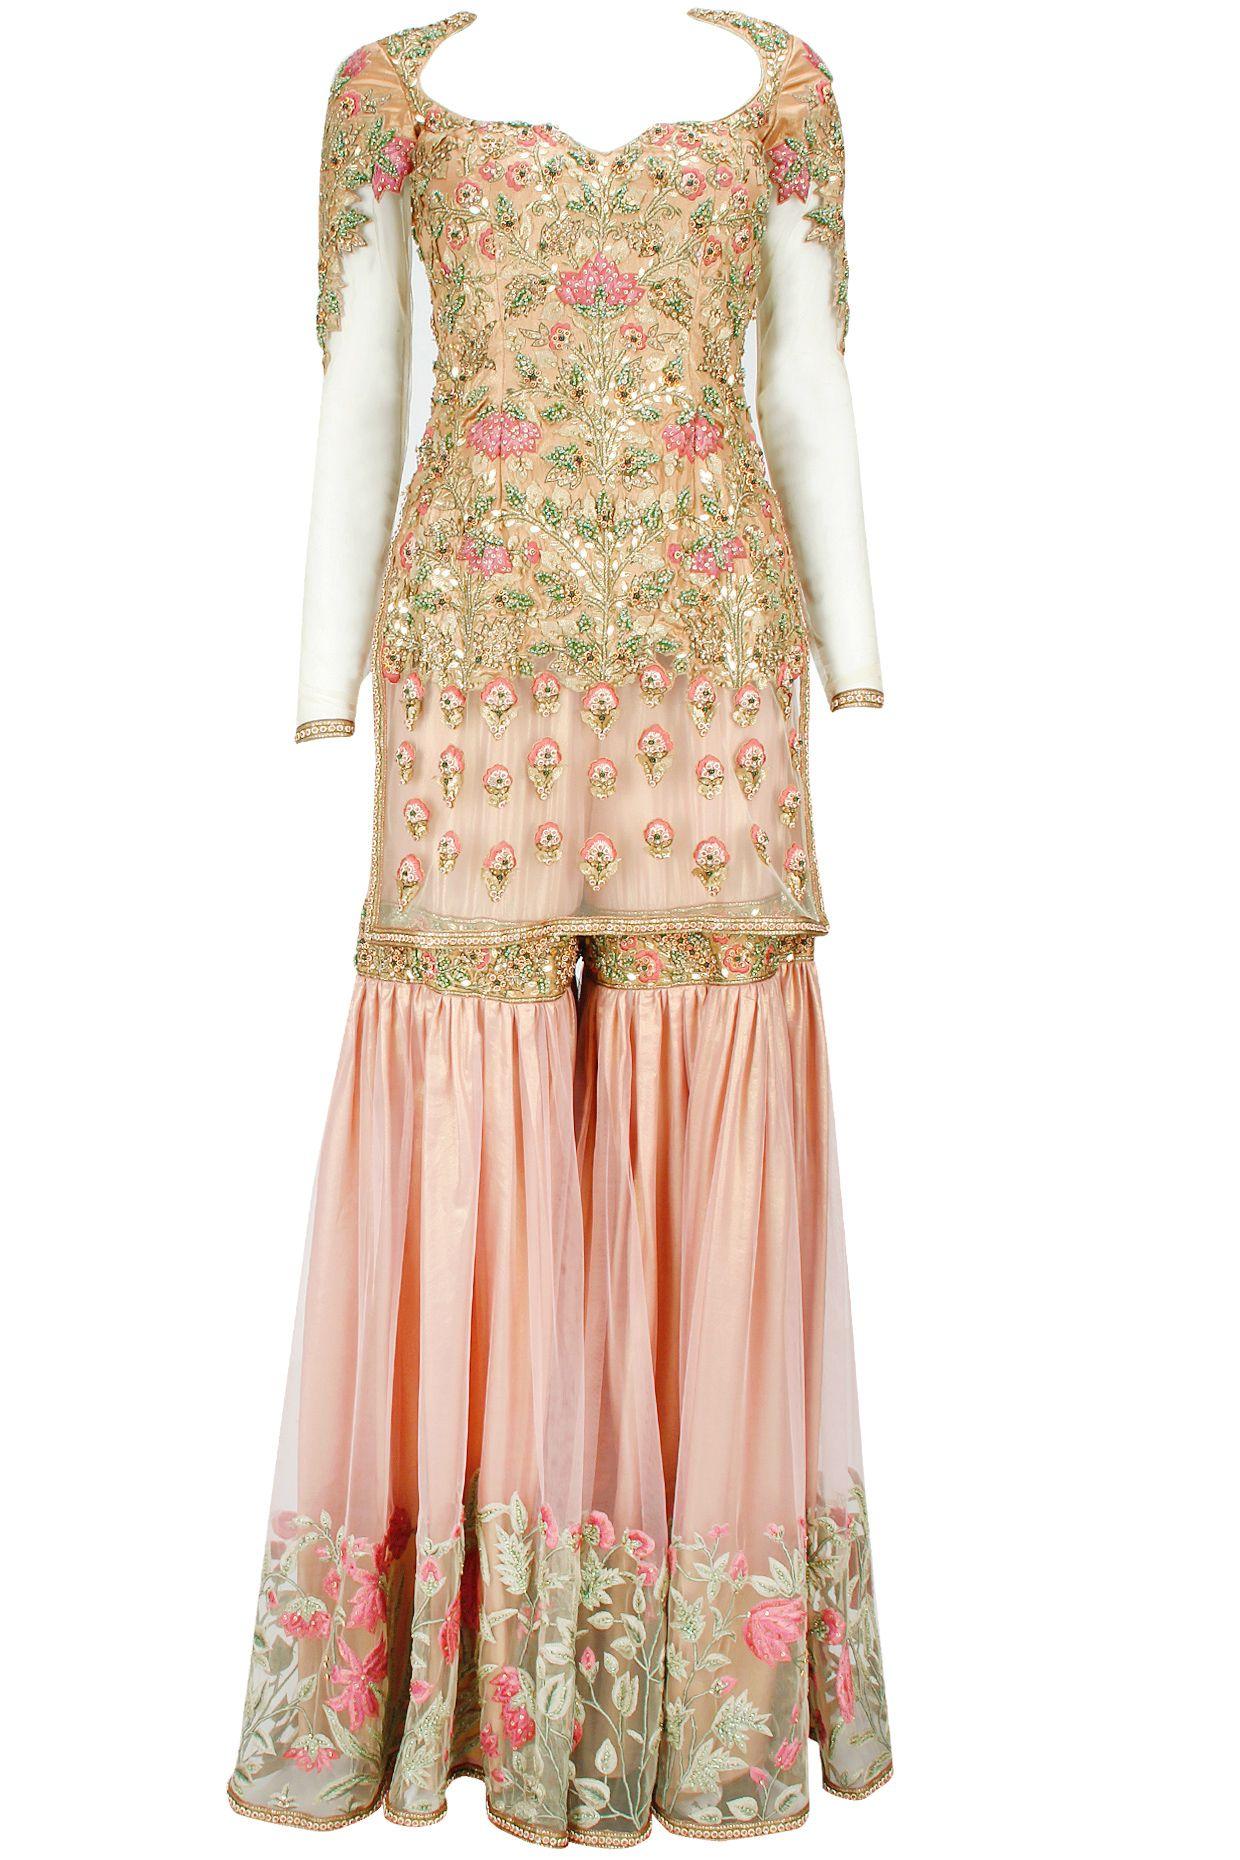 1698df6427 Powder pink and gold thread work sharara set available only at Kehkashan  Tariq's Pop-Up Shop.